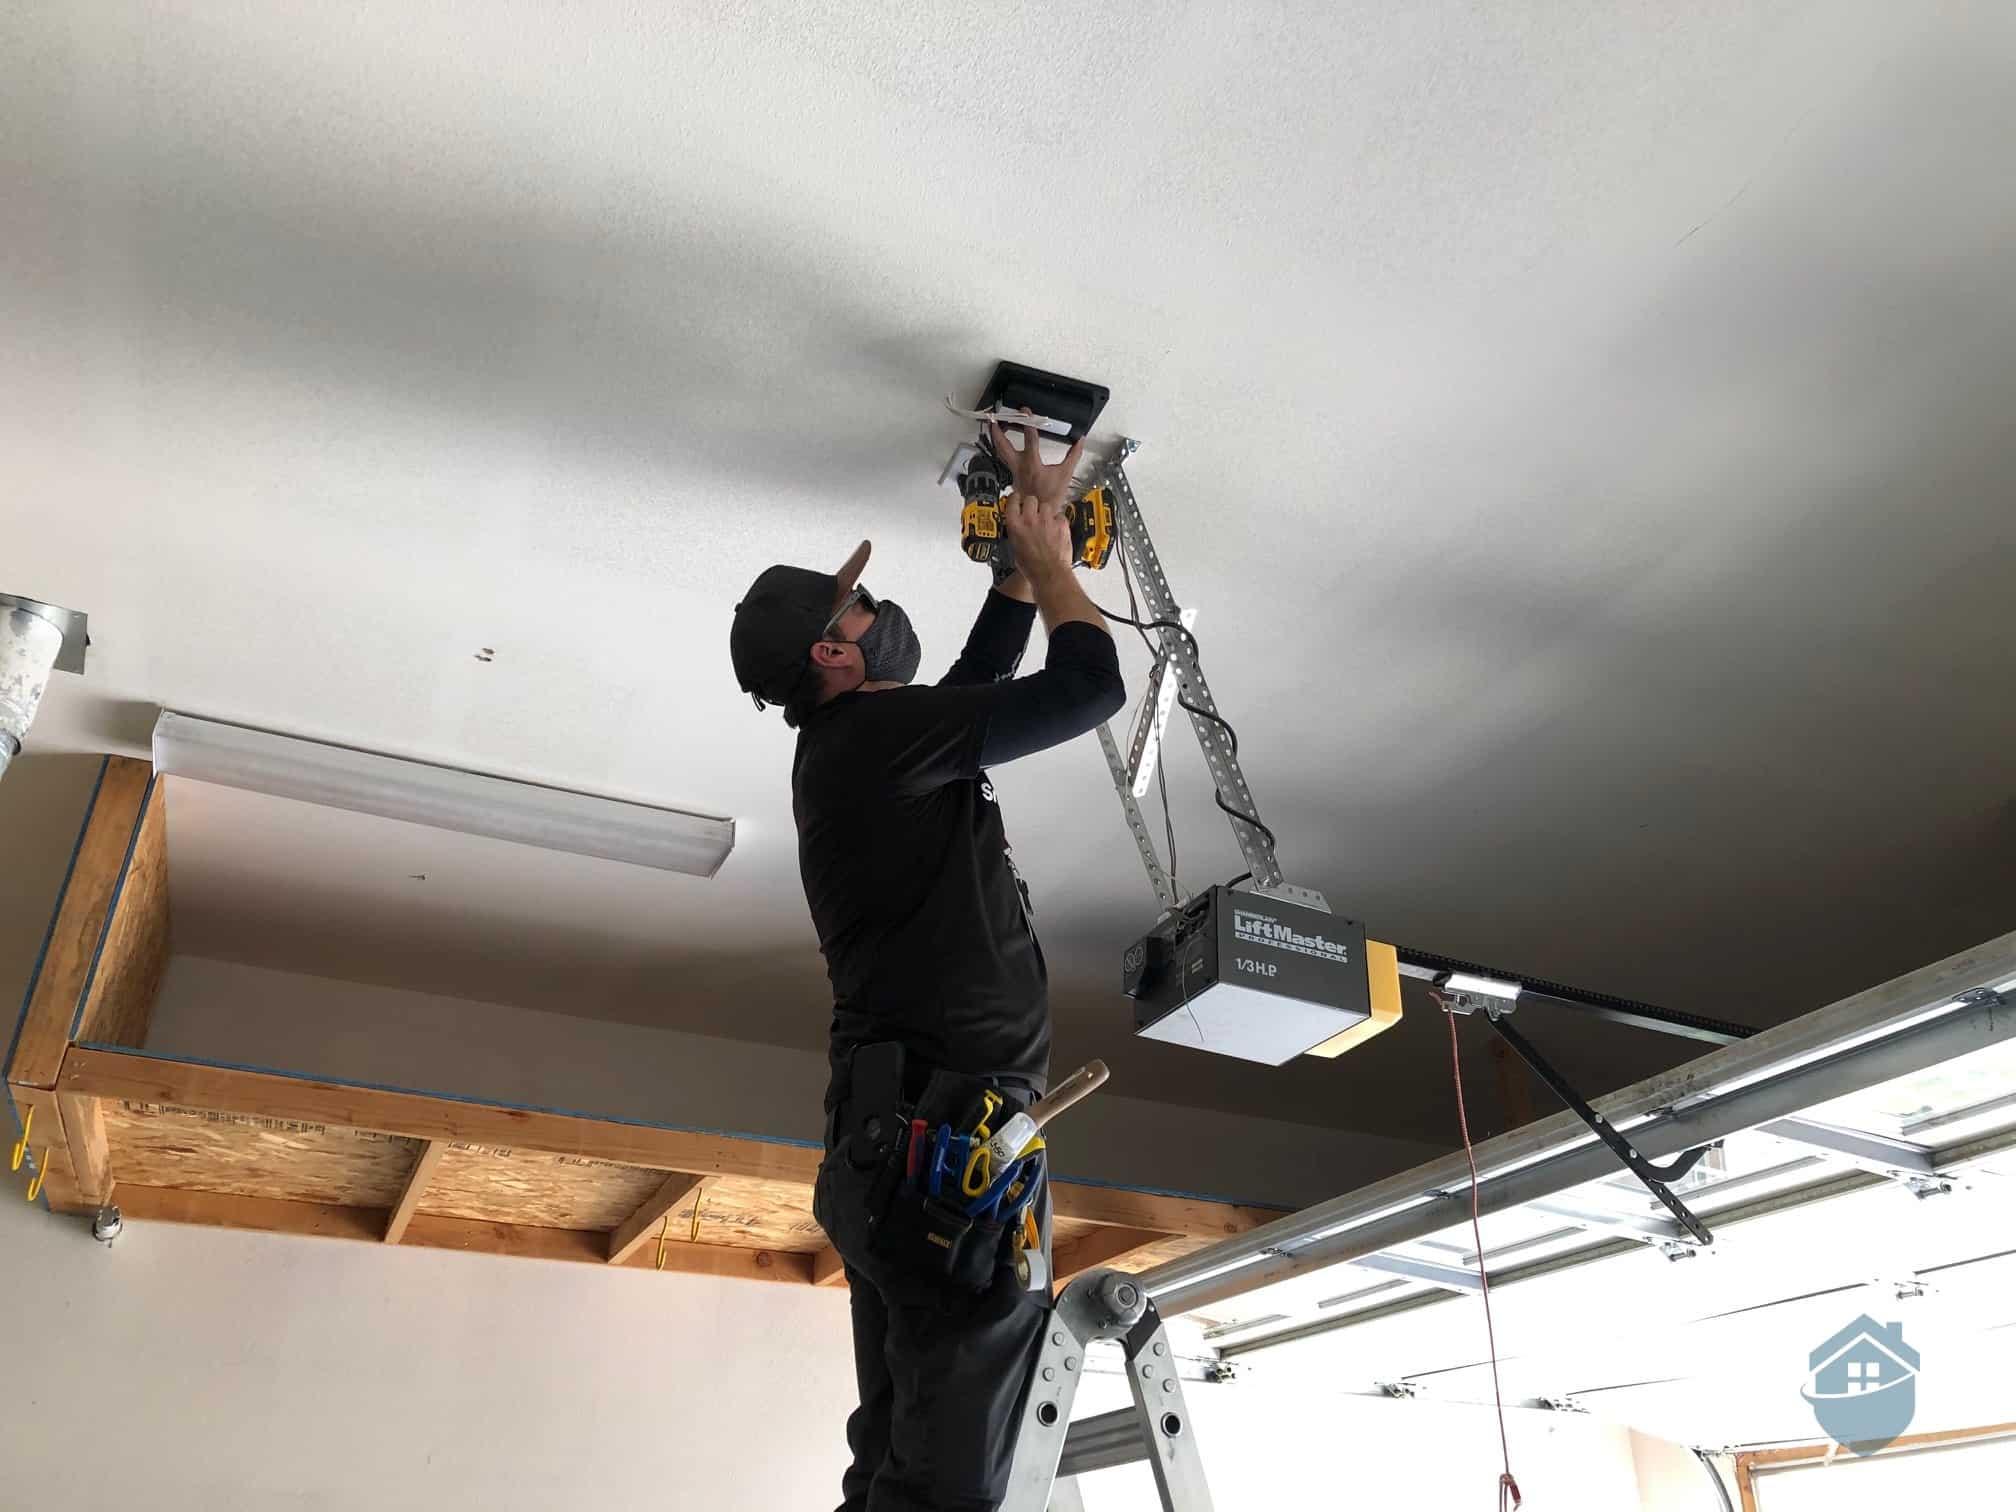 Don, the Vivint Installation Technician, installing our Smart Garage Controller